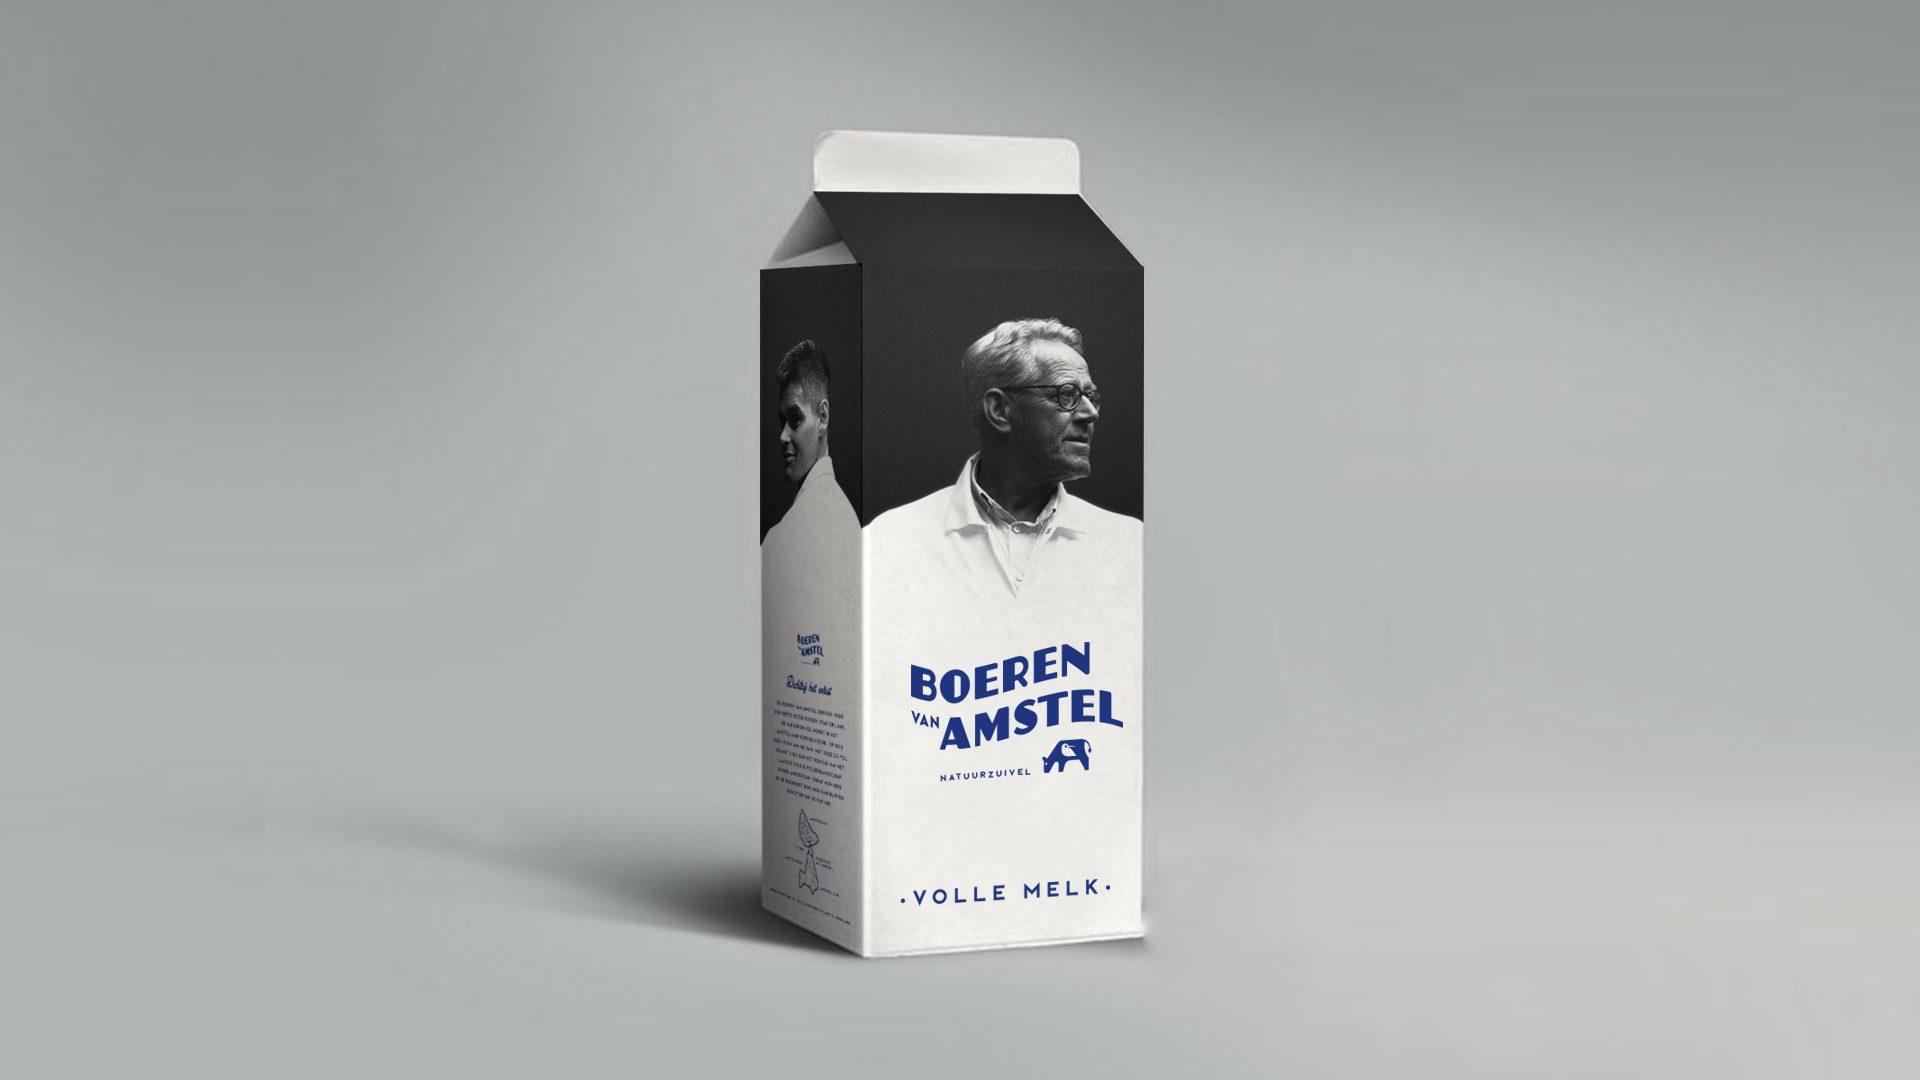 Boeren van amstel melk